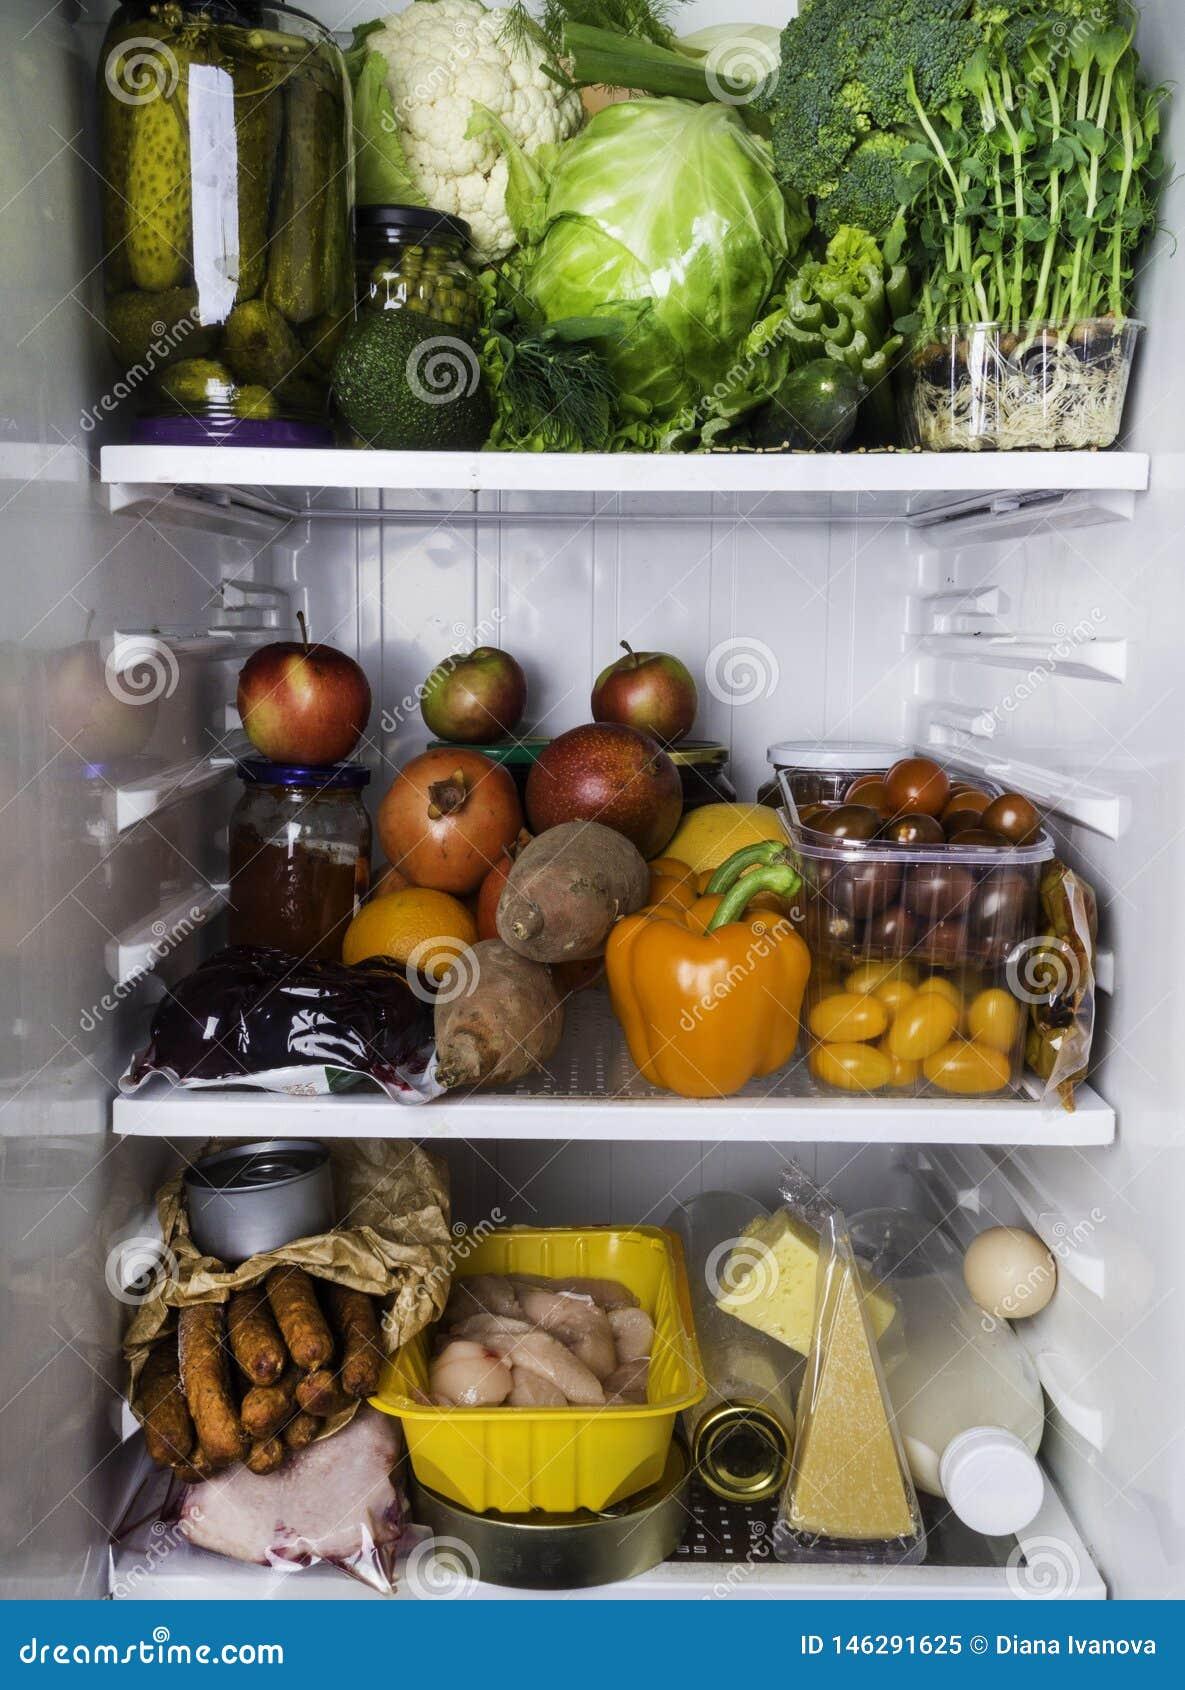 Open Fridge Full Of Fresh Fruits And Vegetables Healthy